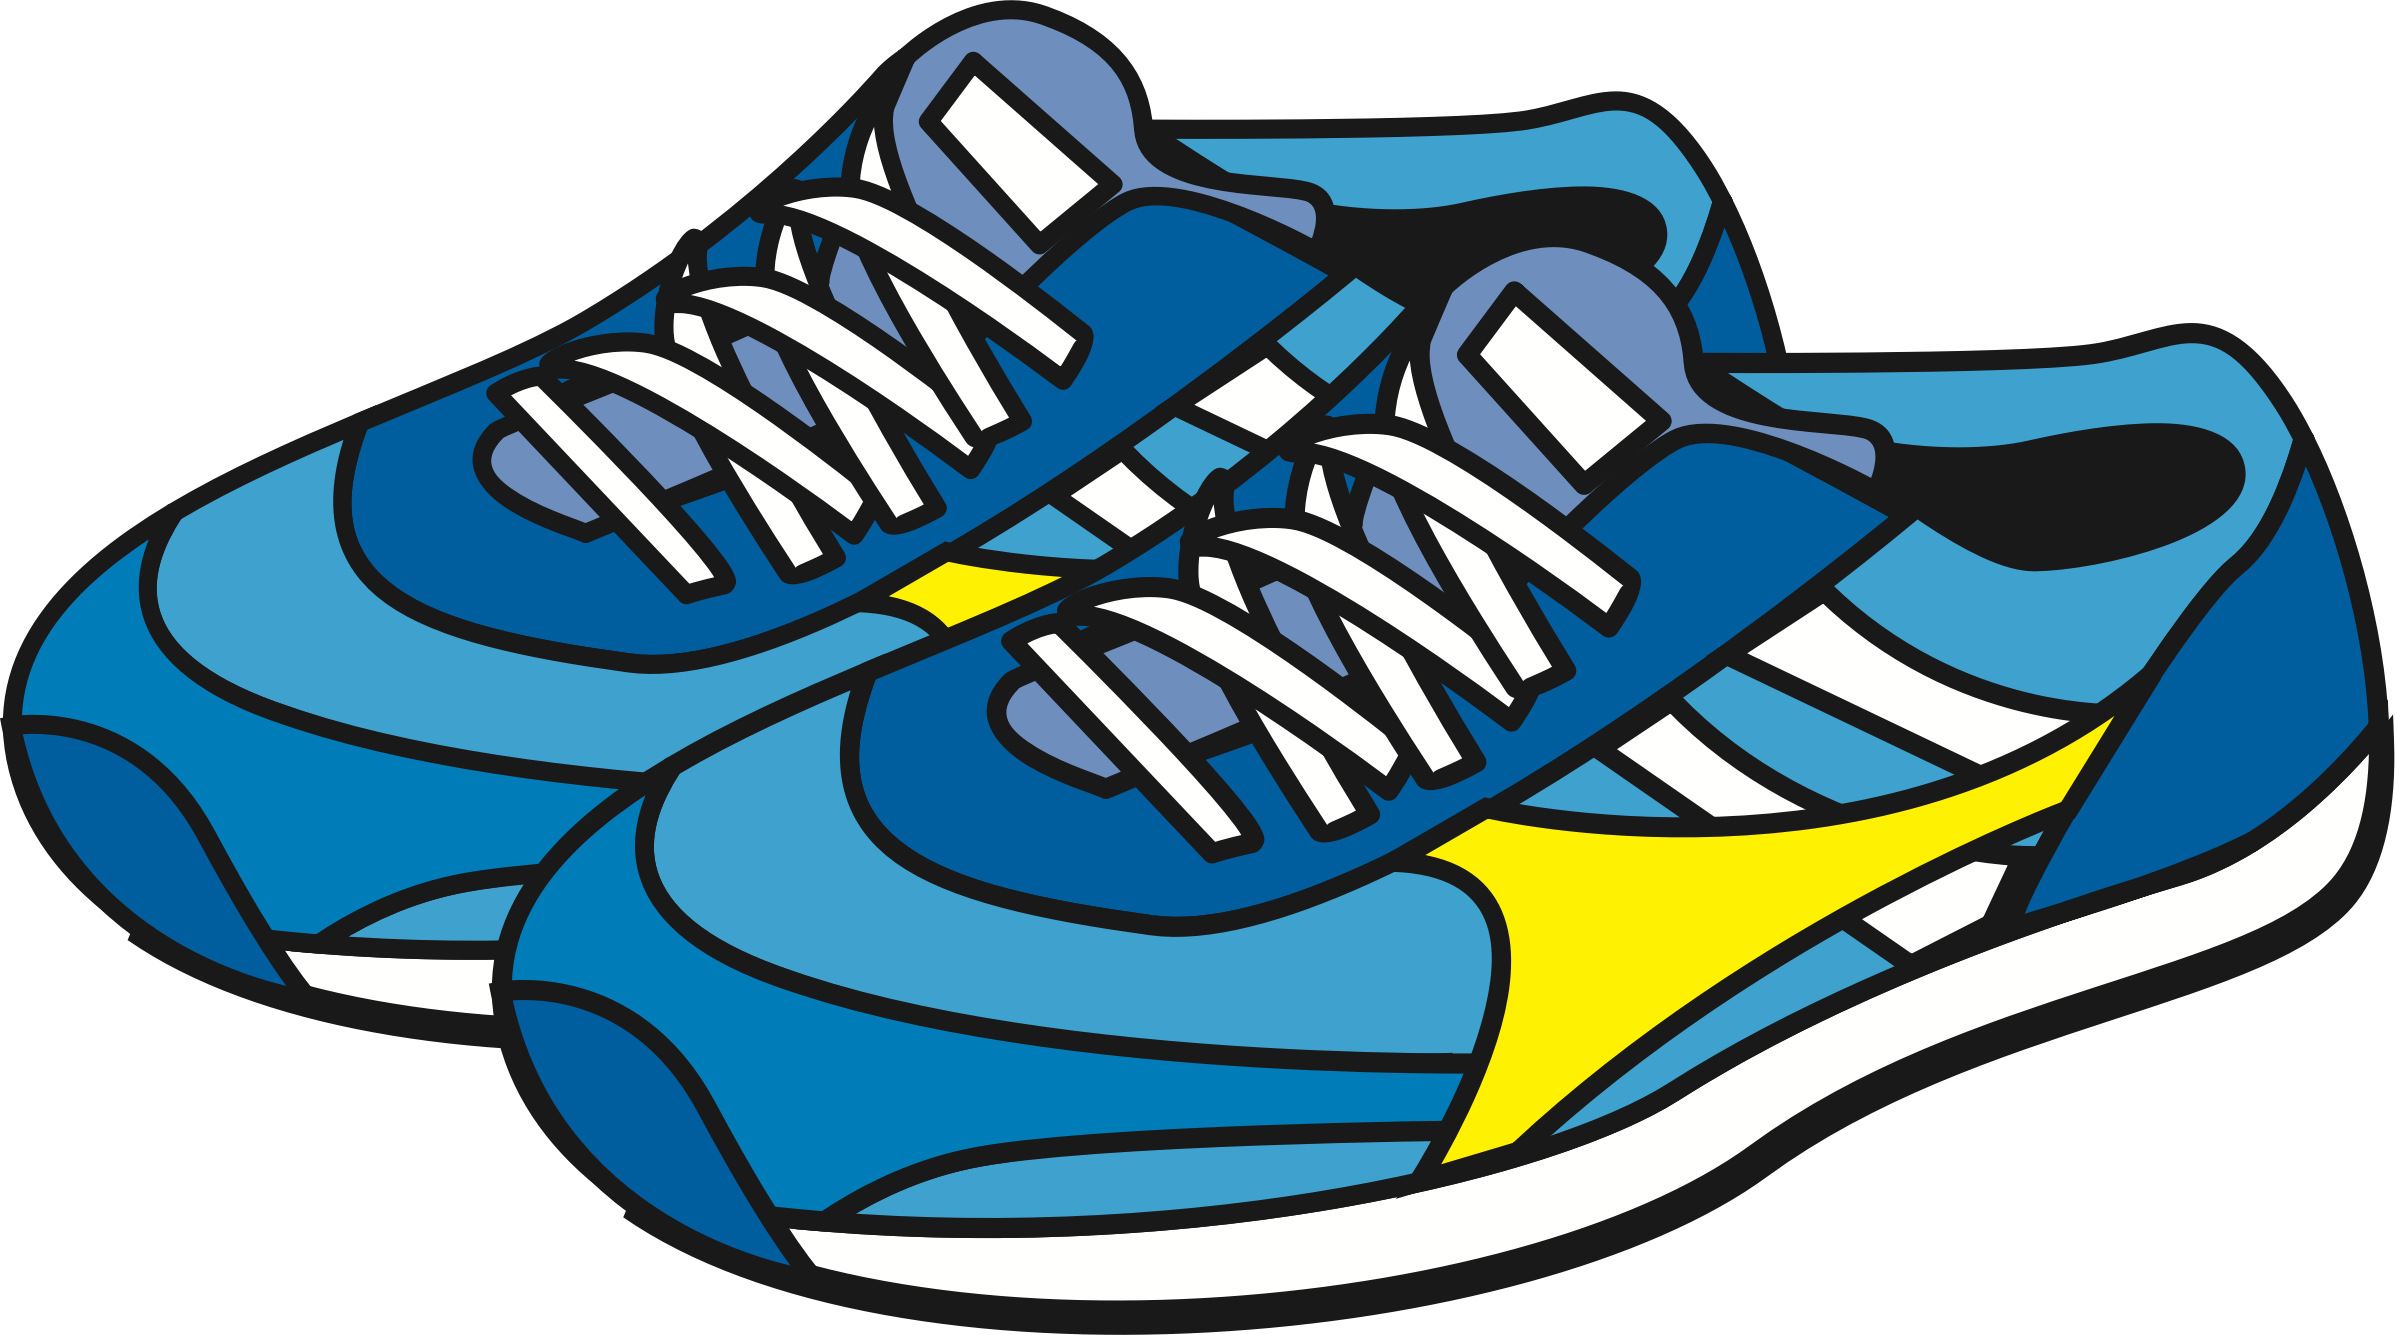 Clipart walking walking shoe. Jogging shoes big image